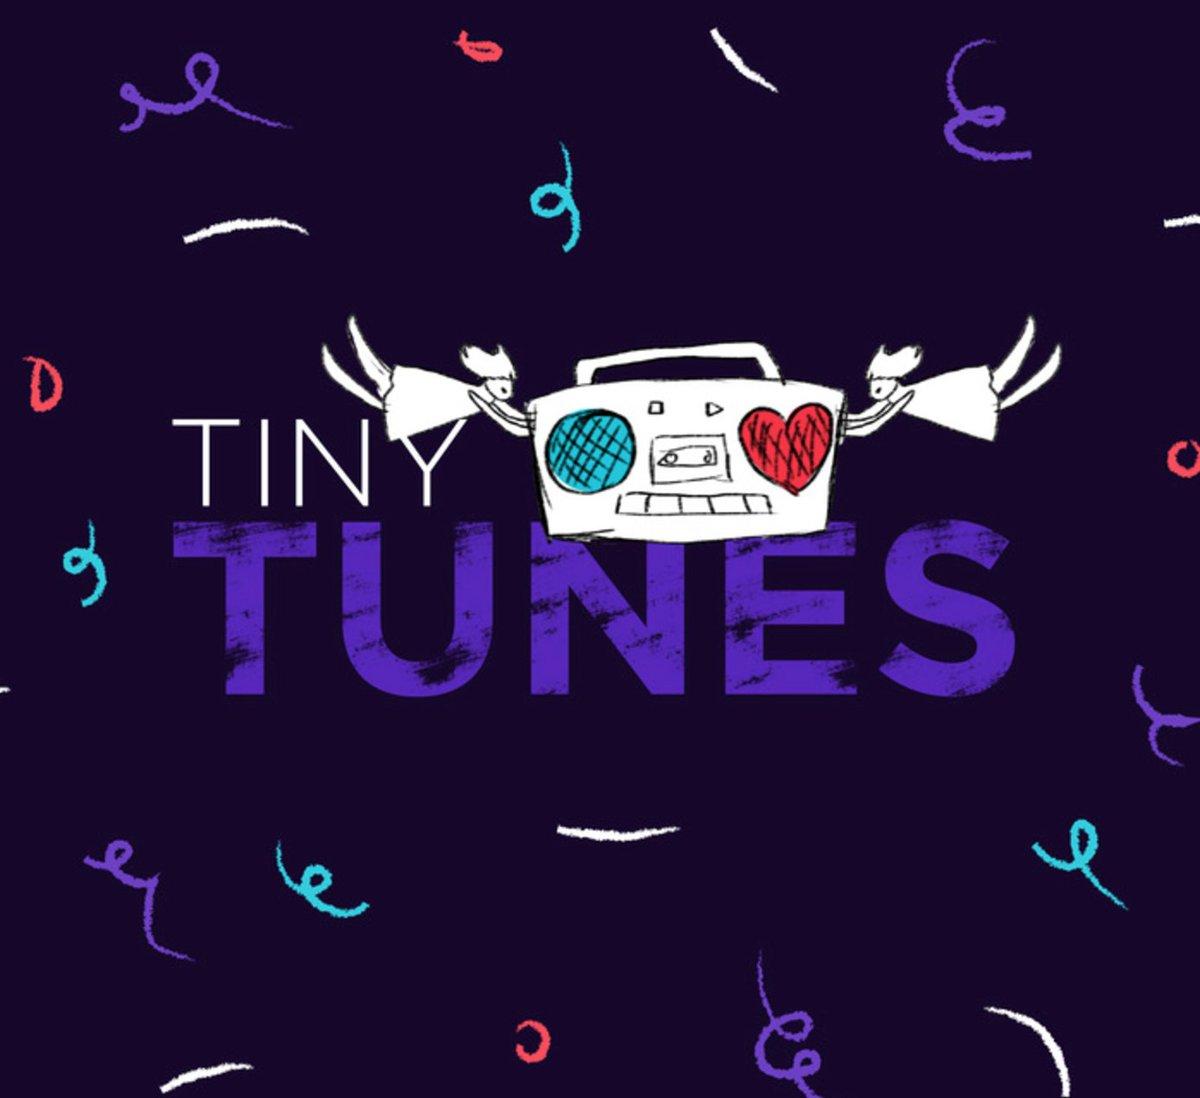 Where Tiny Stories get turned into songs... https://t.co/ZgQ4KC6J1v https://t.co/aiuWvfWUz4